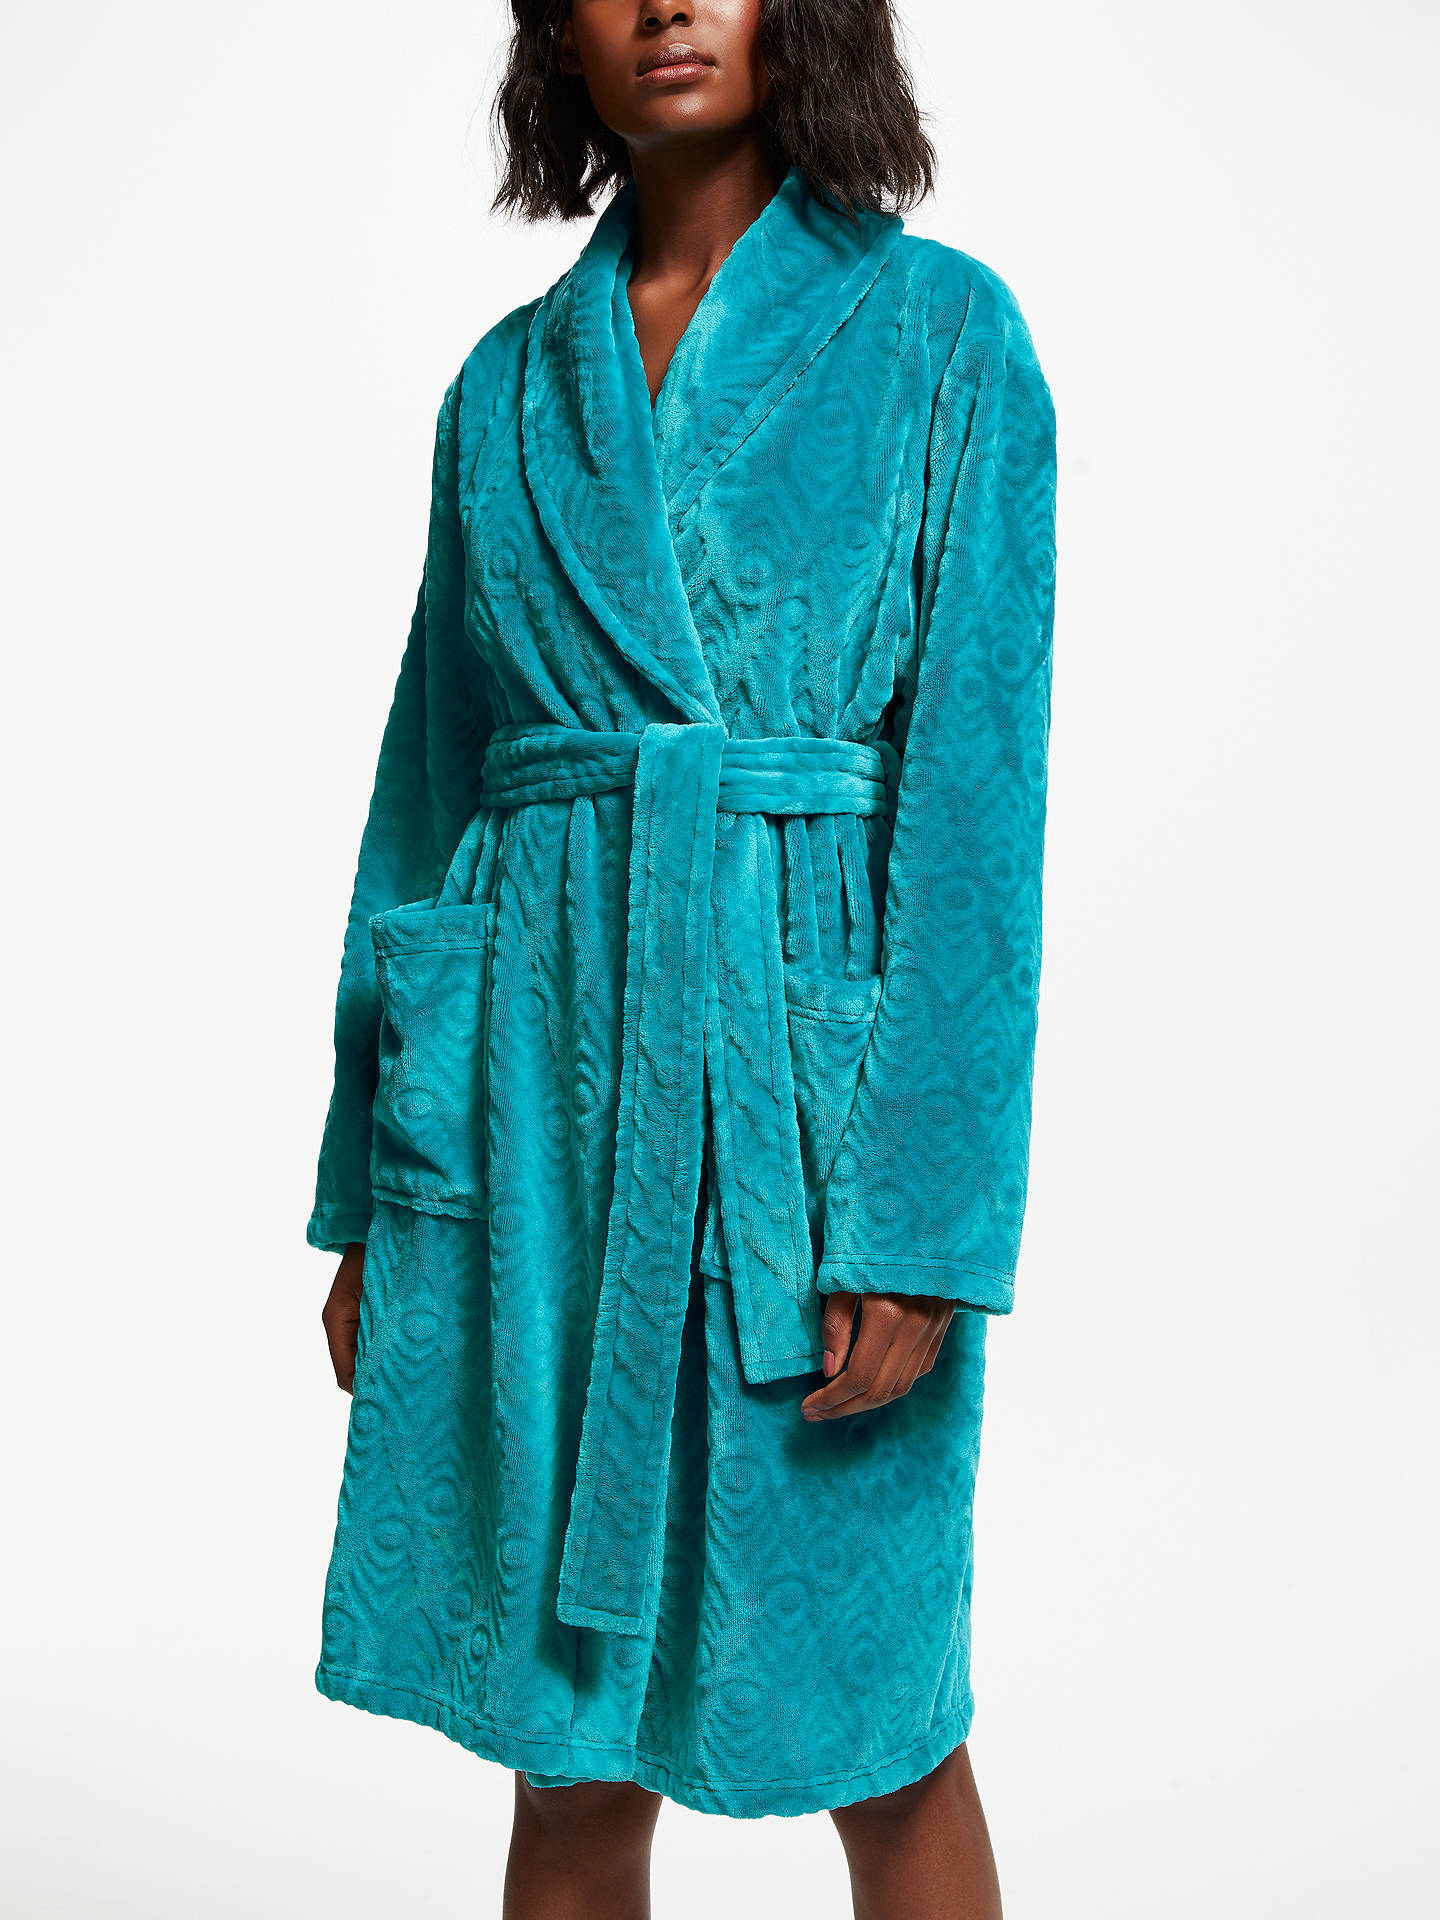 John Lewis Partners Talitha Peacock Embossed Fleece Dressing Gown